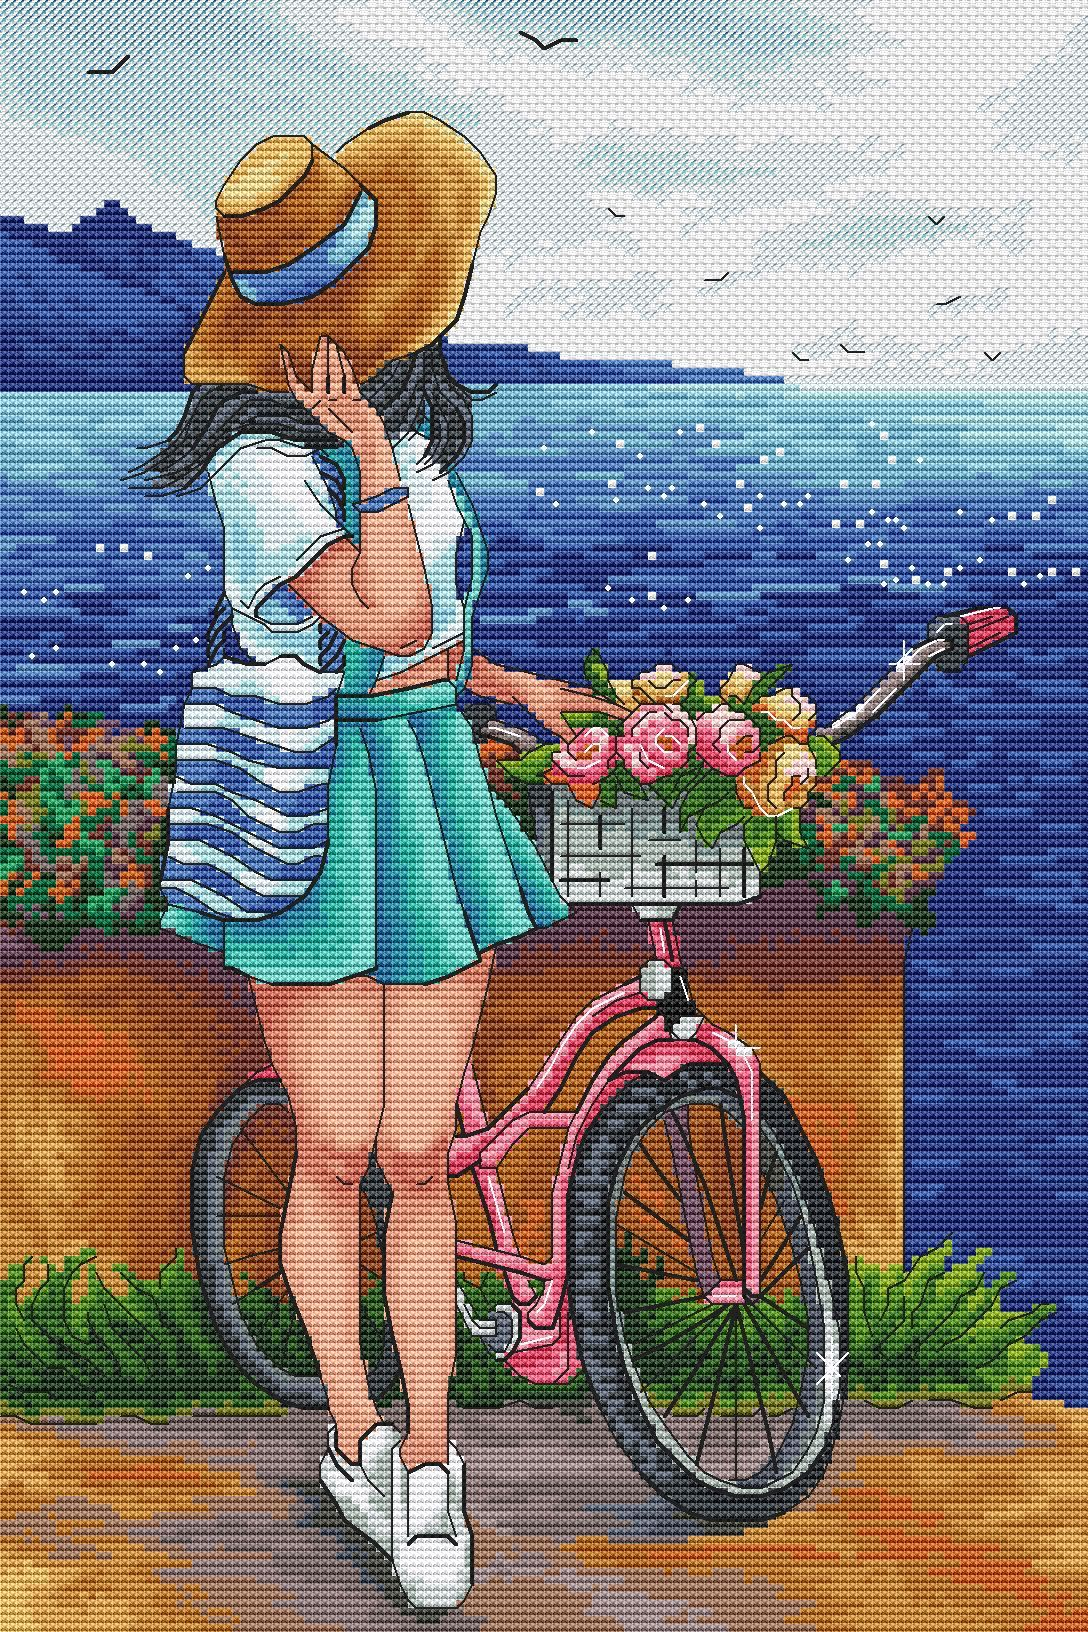 Cross stitch pattern the girl and the bike sea landscape